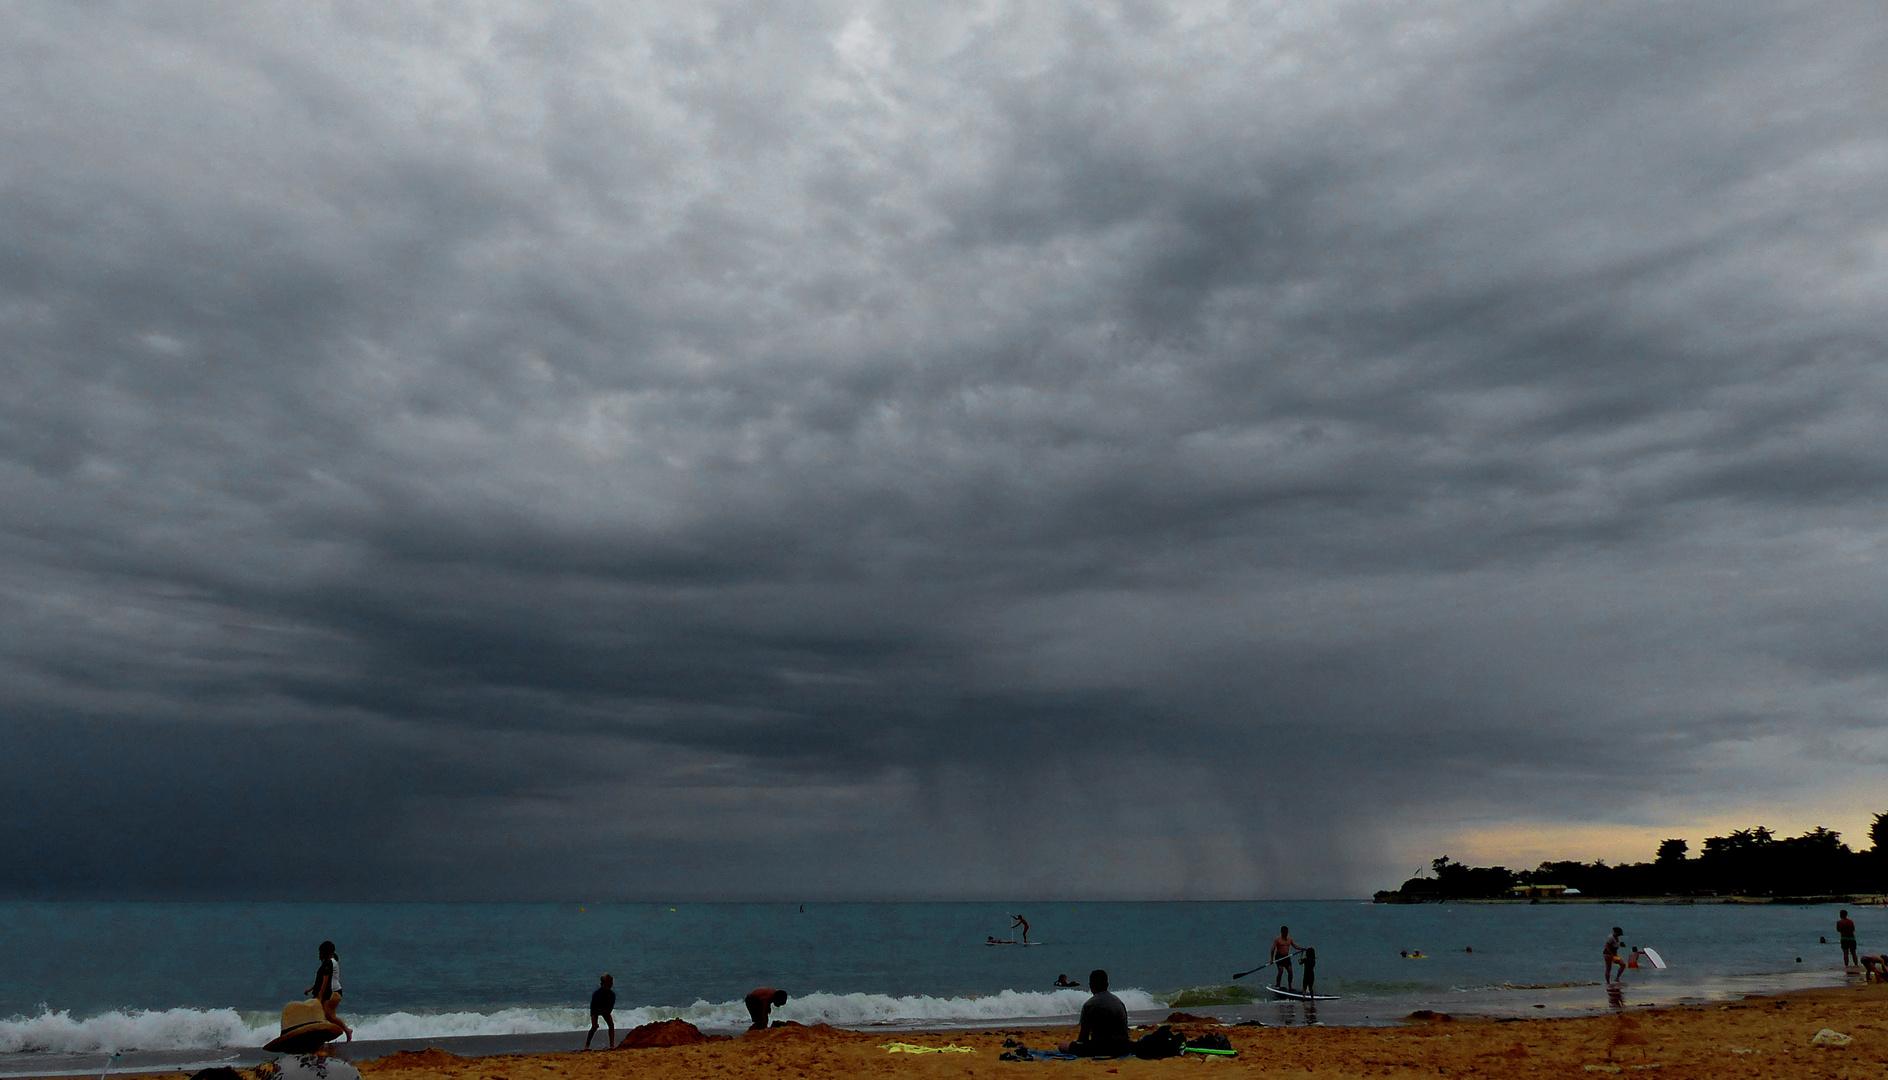 L'orage menace....